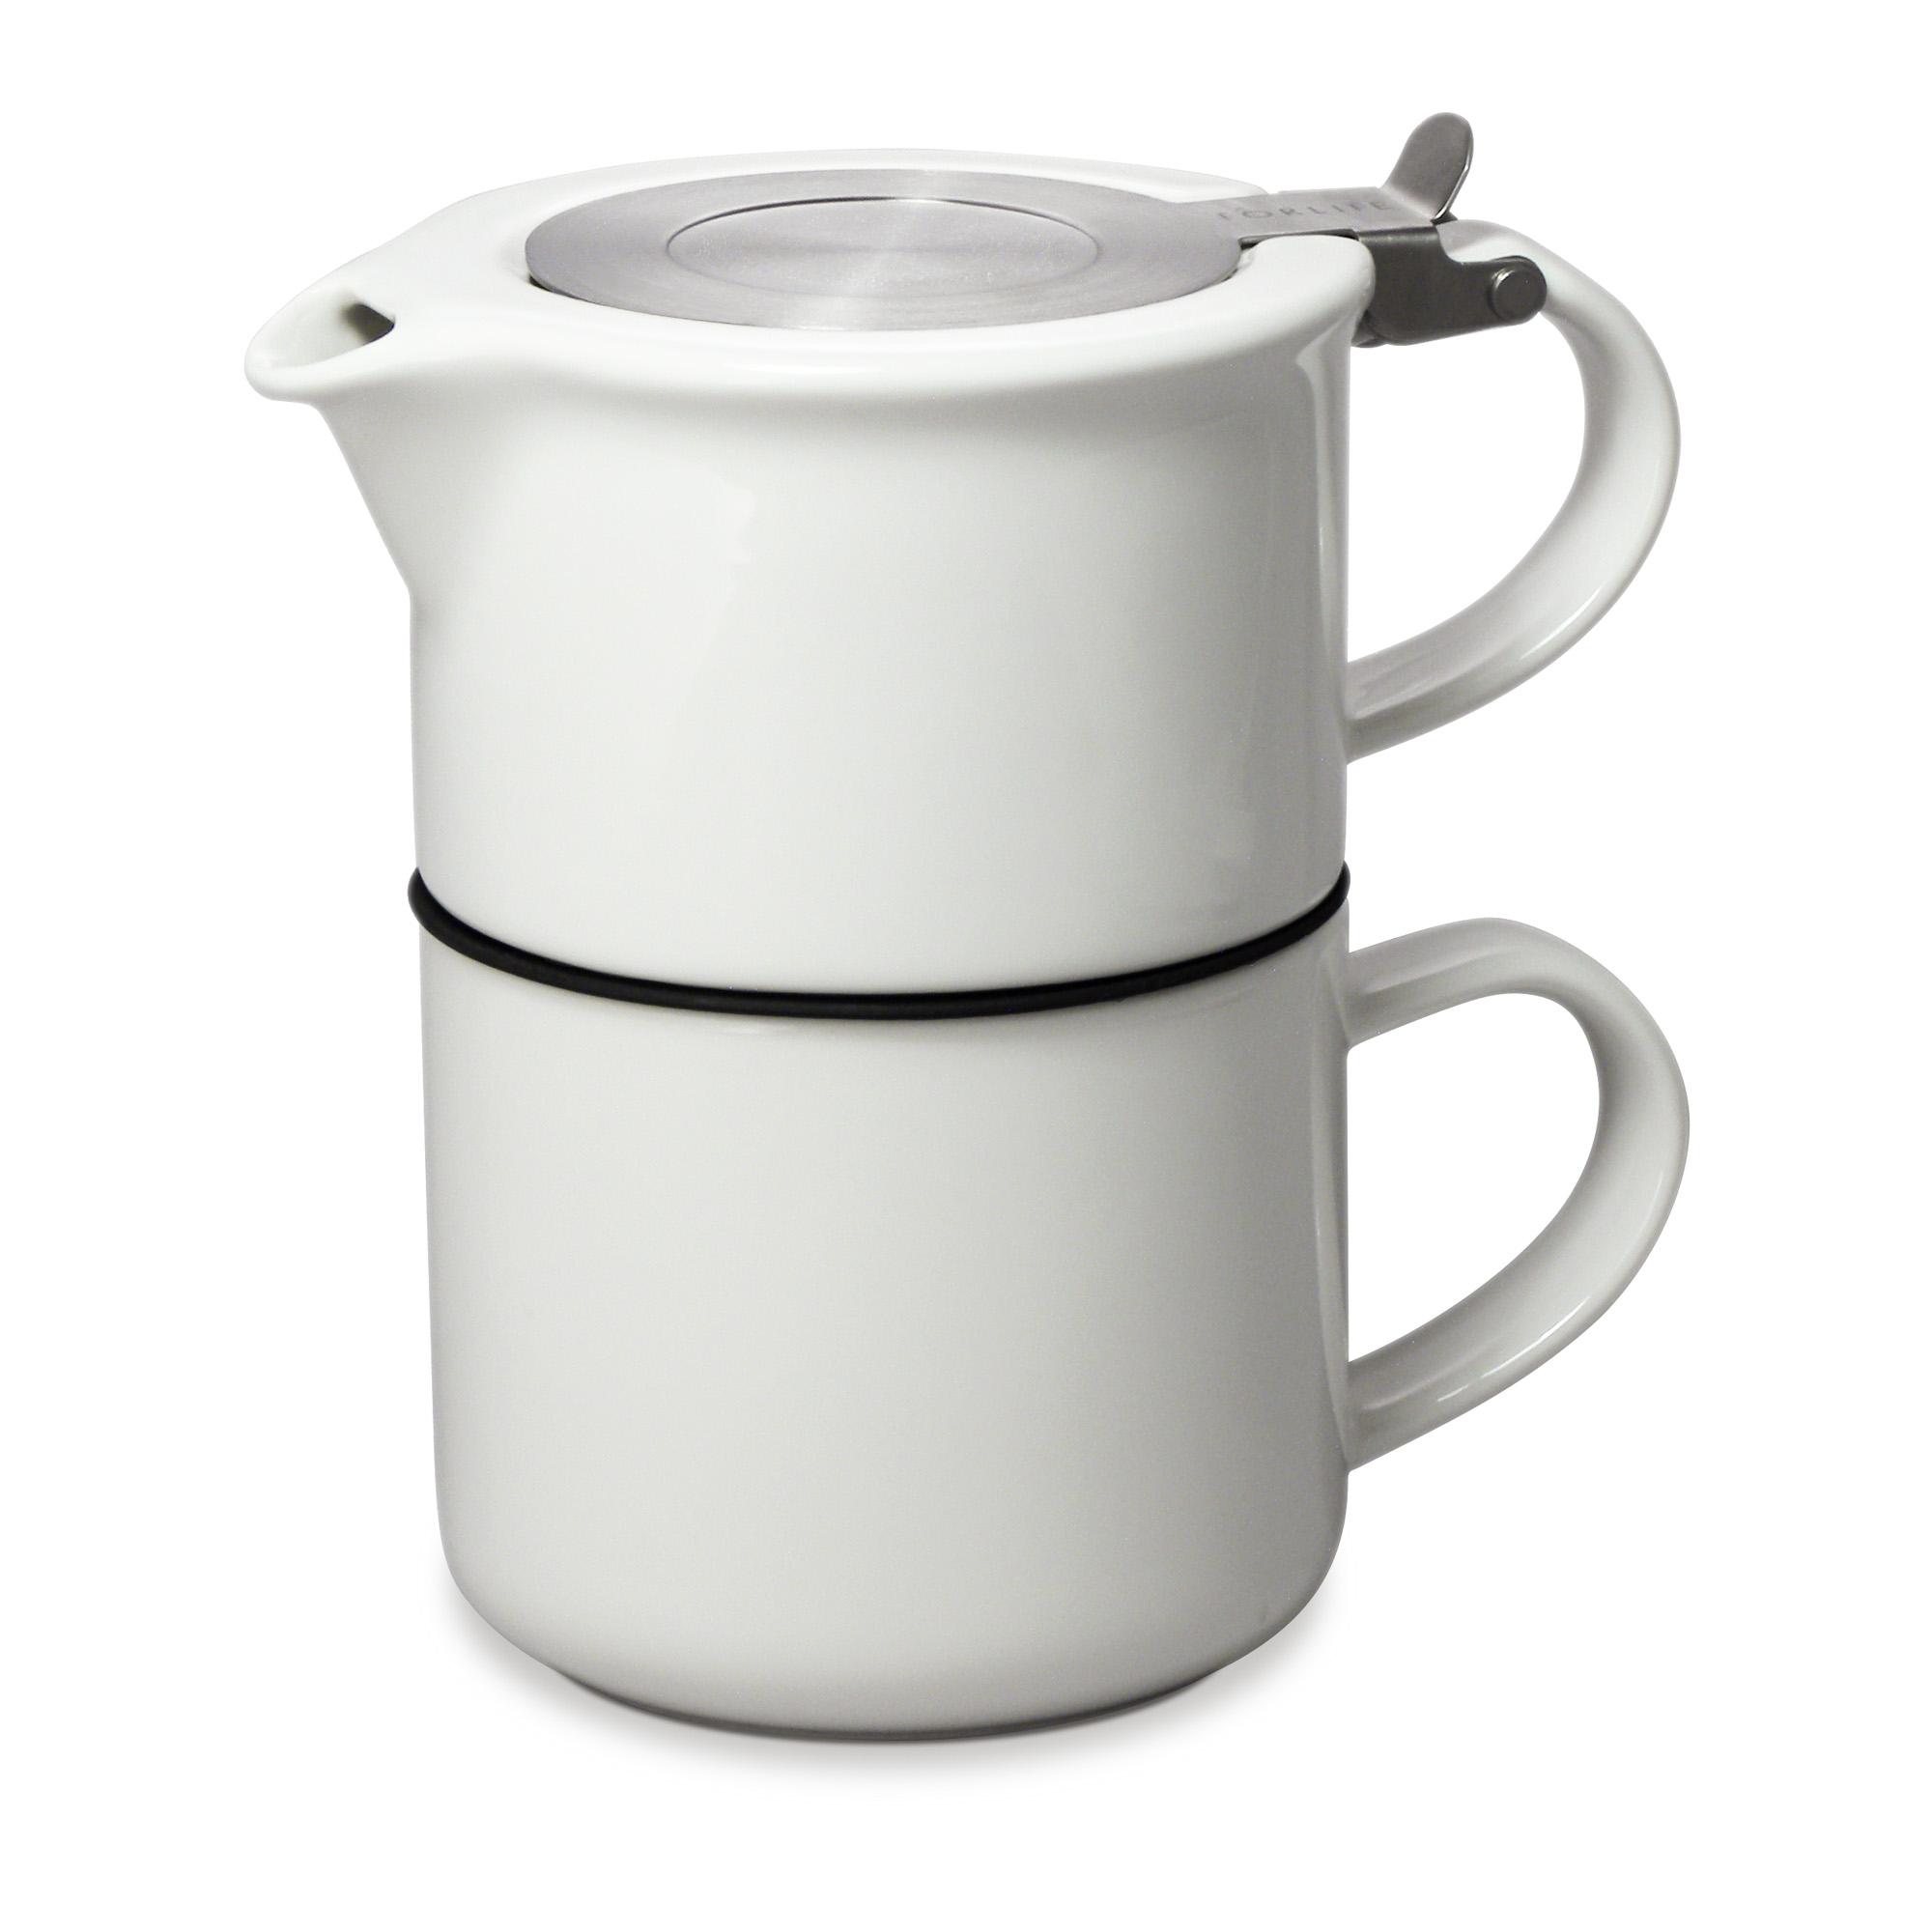 Teapots + Tea Infuser Baskets